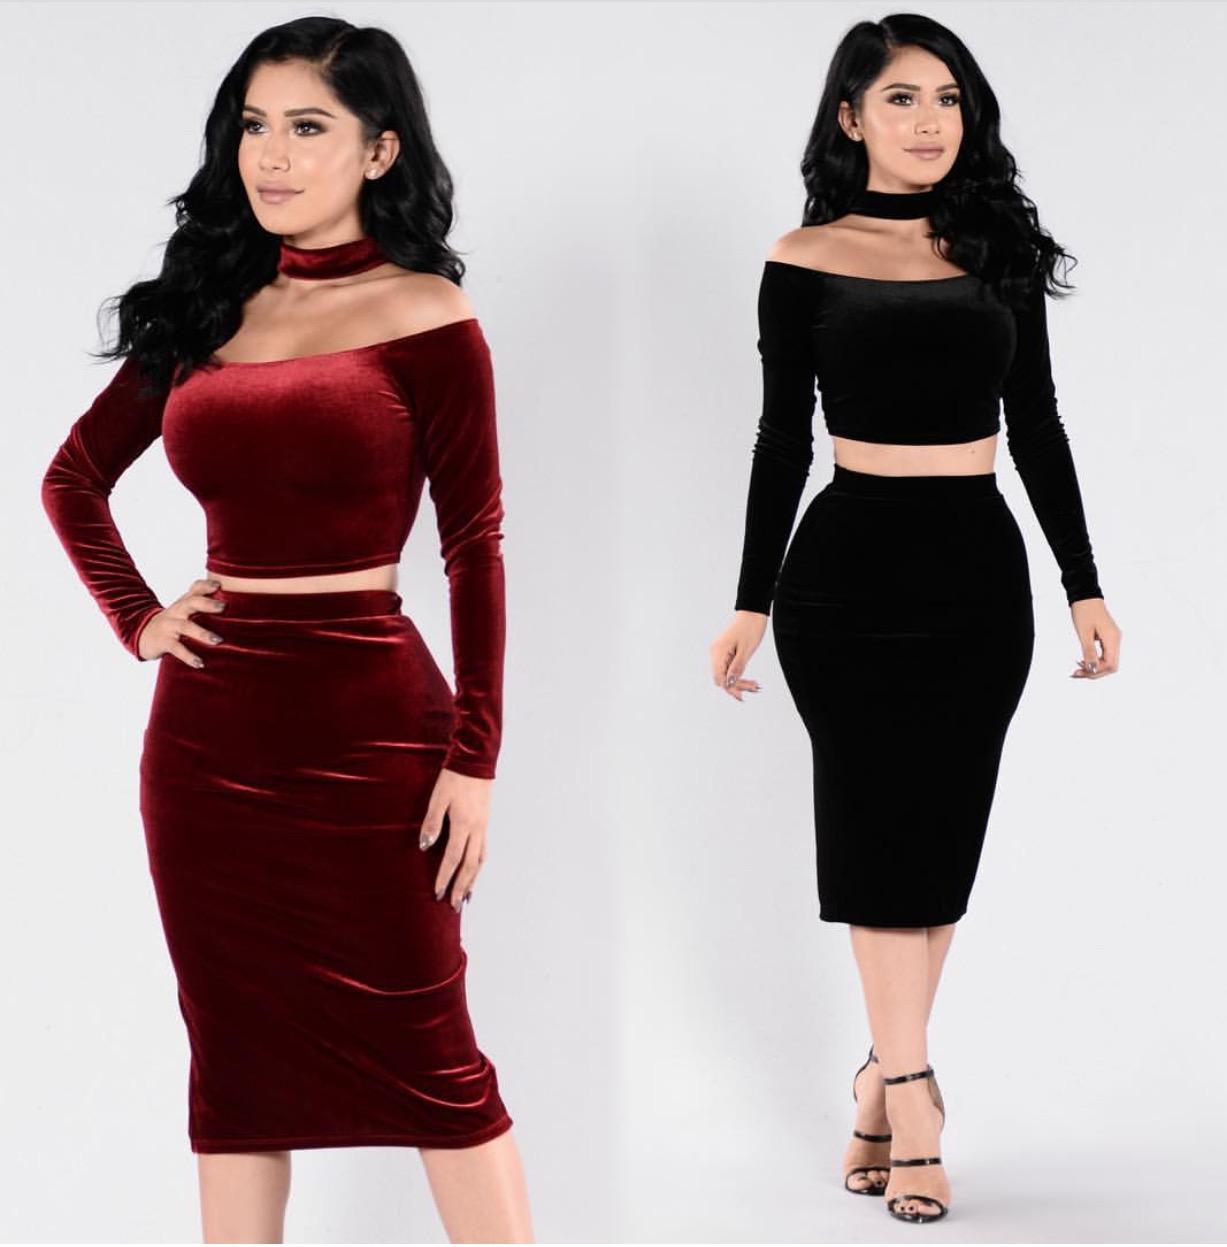 Sherrie Choker Two Piece Velvet Bodycon Dress · Modas Inc. · Online ... bf9c4617572f